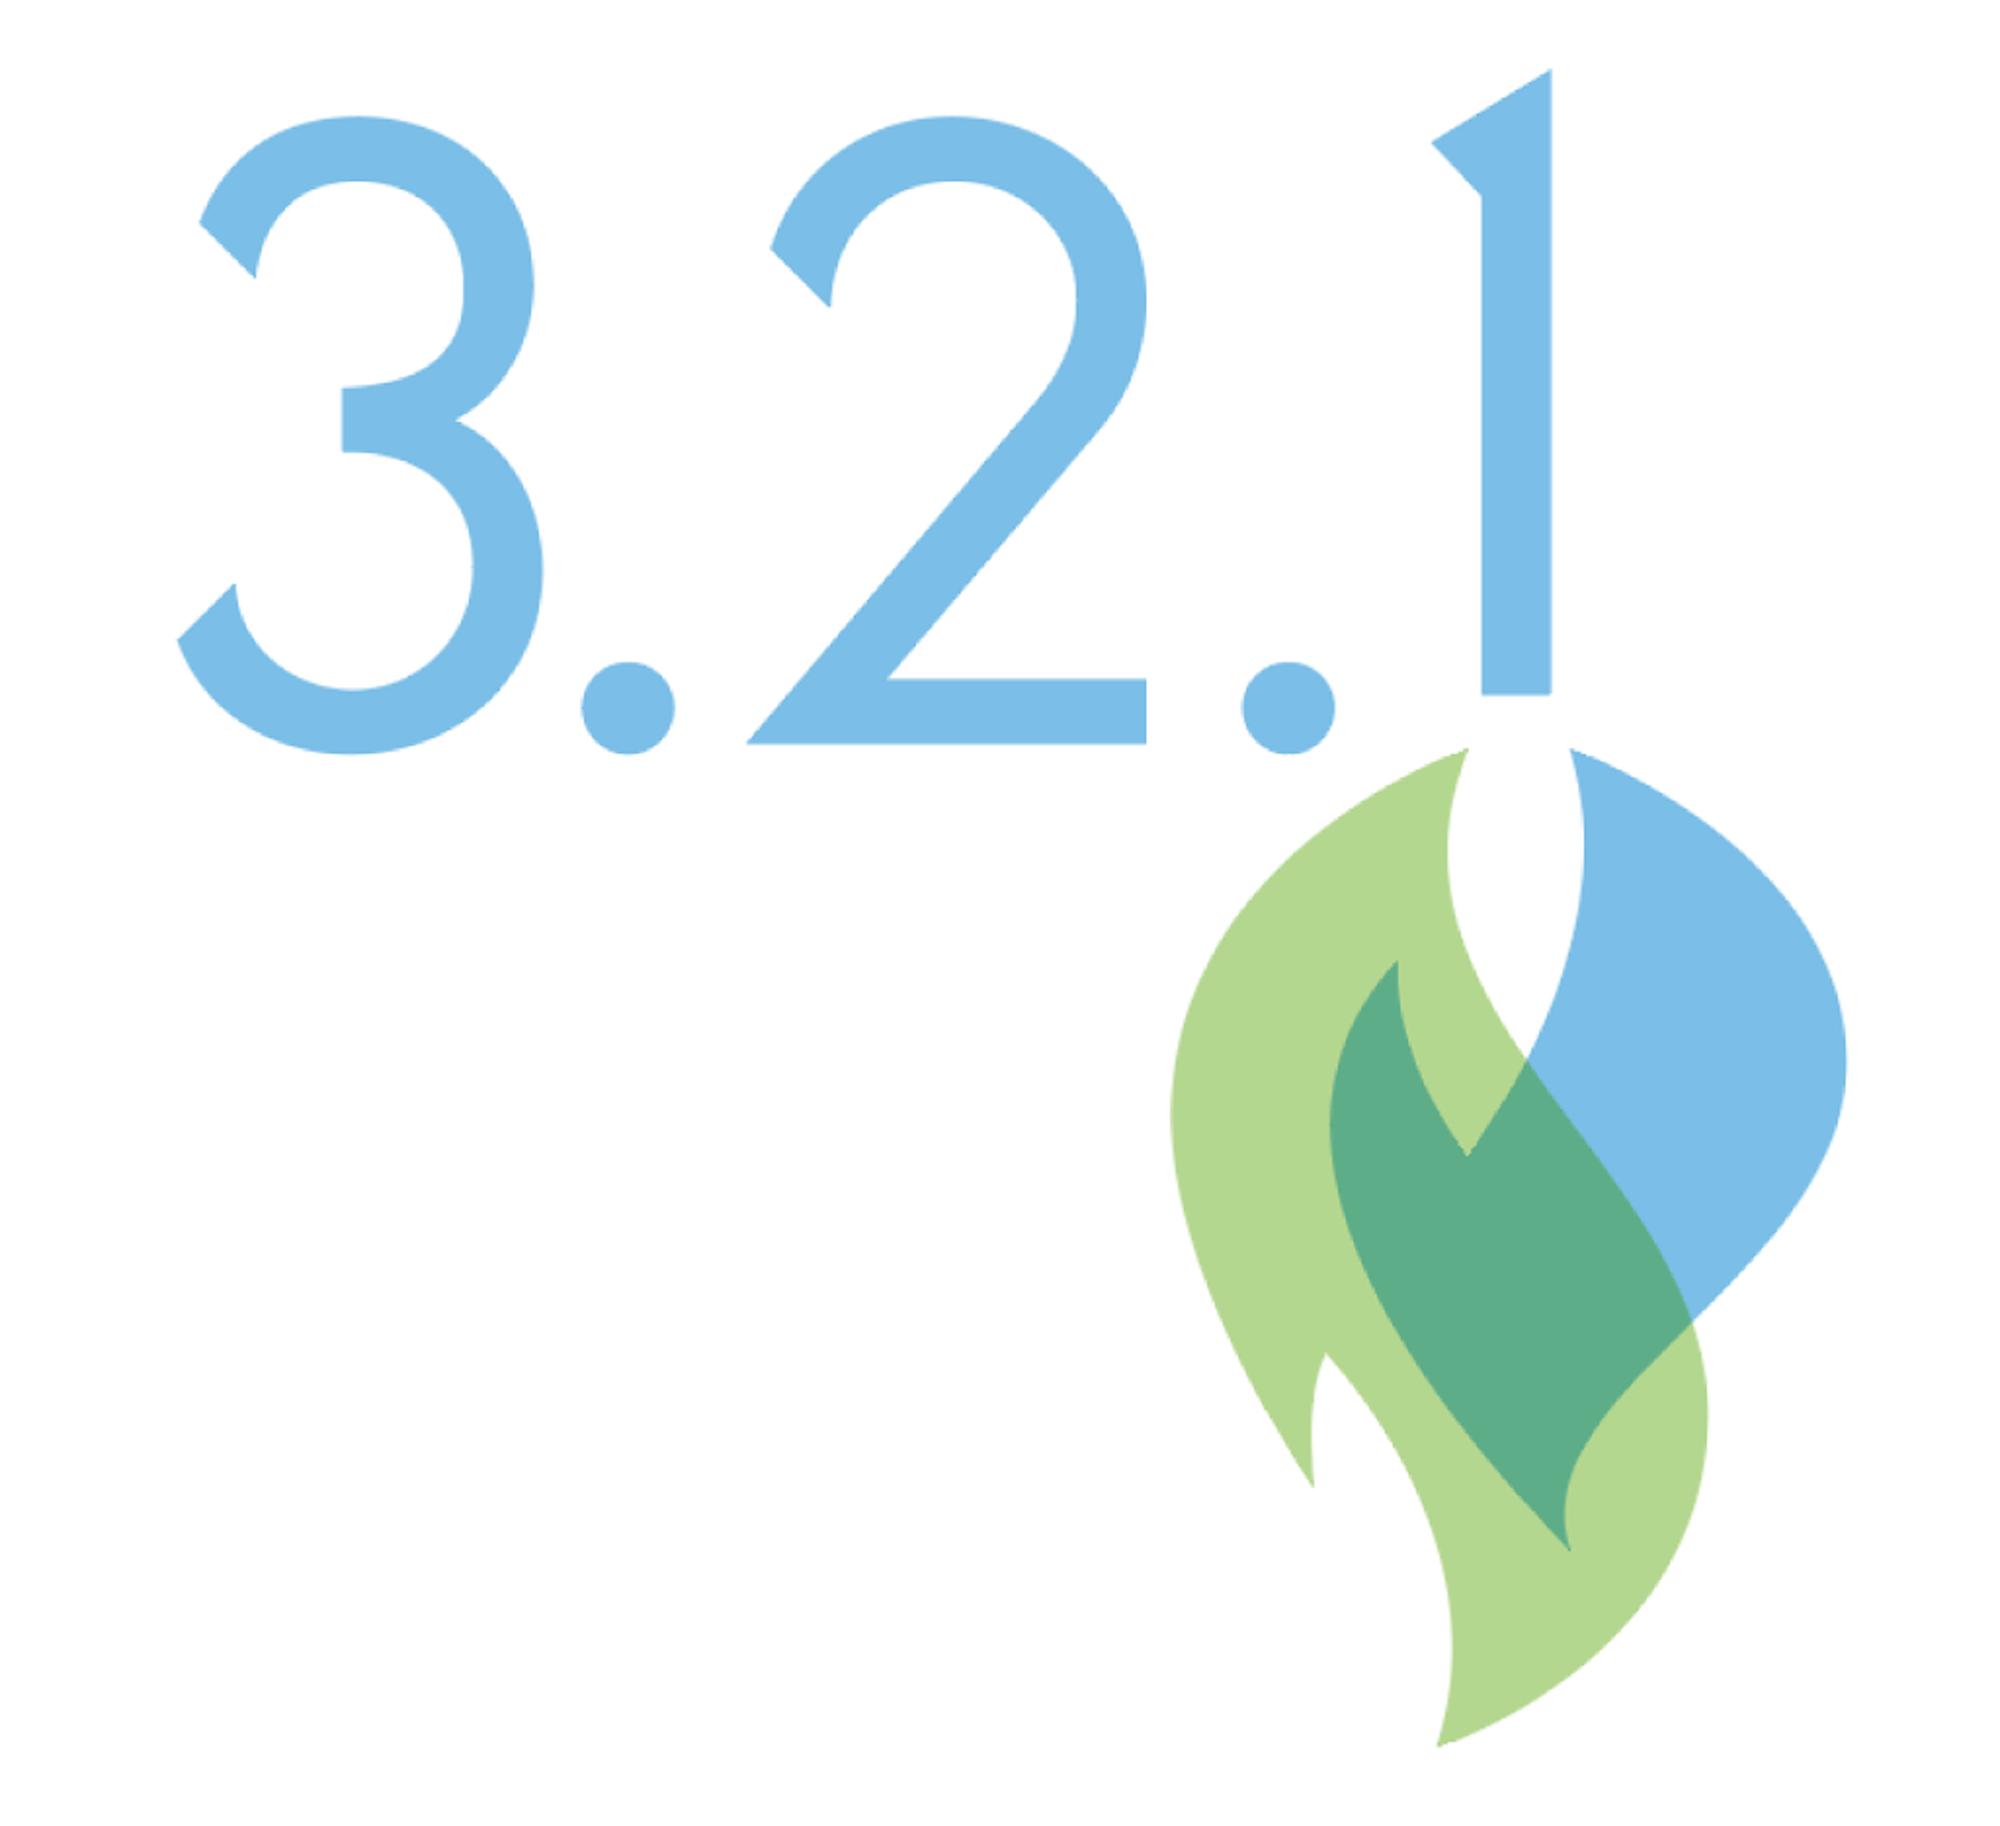 3.2.1.